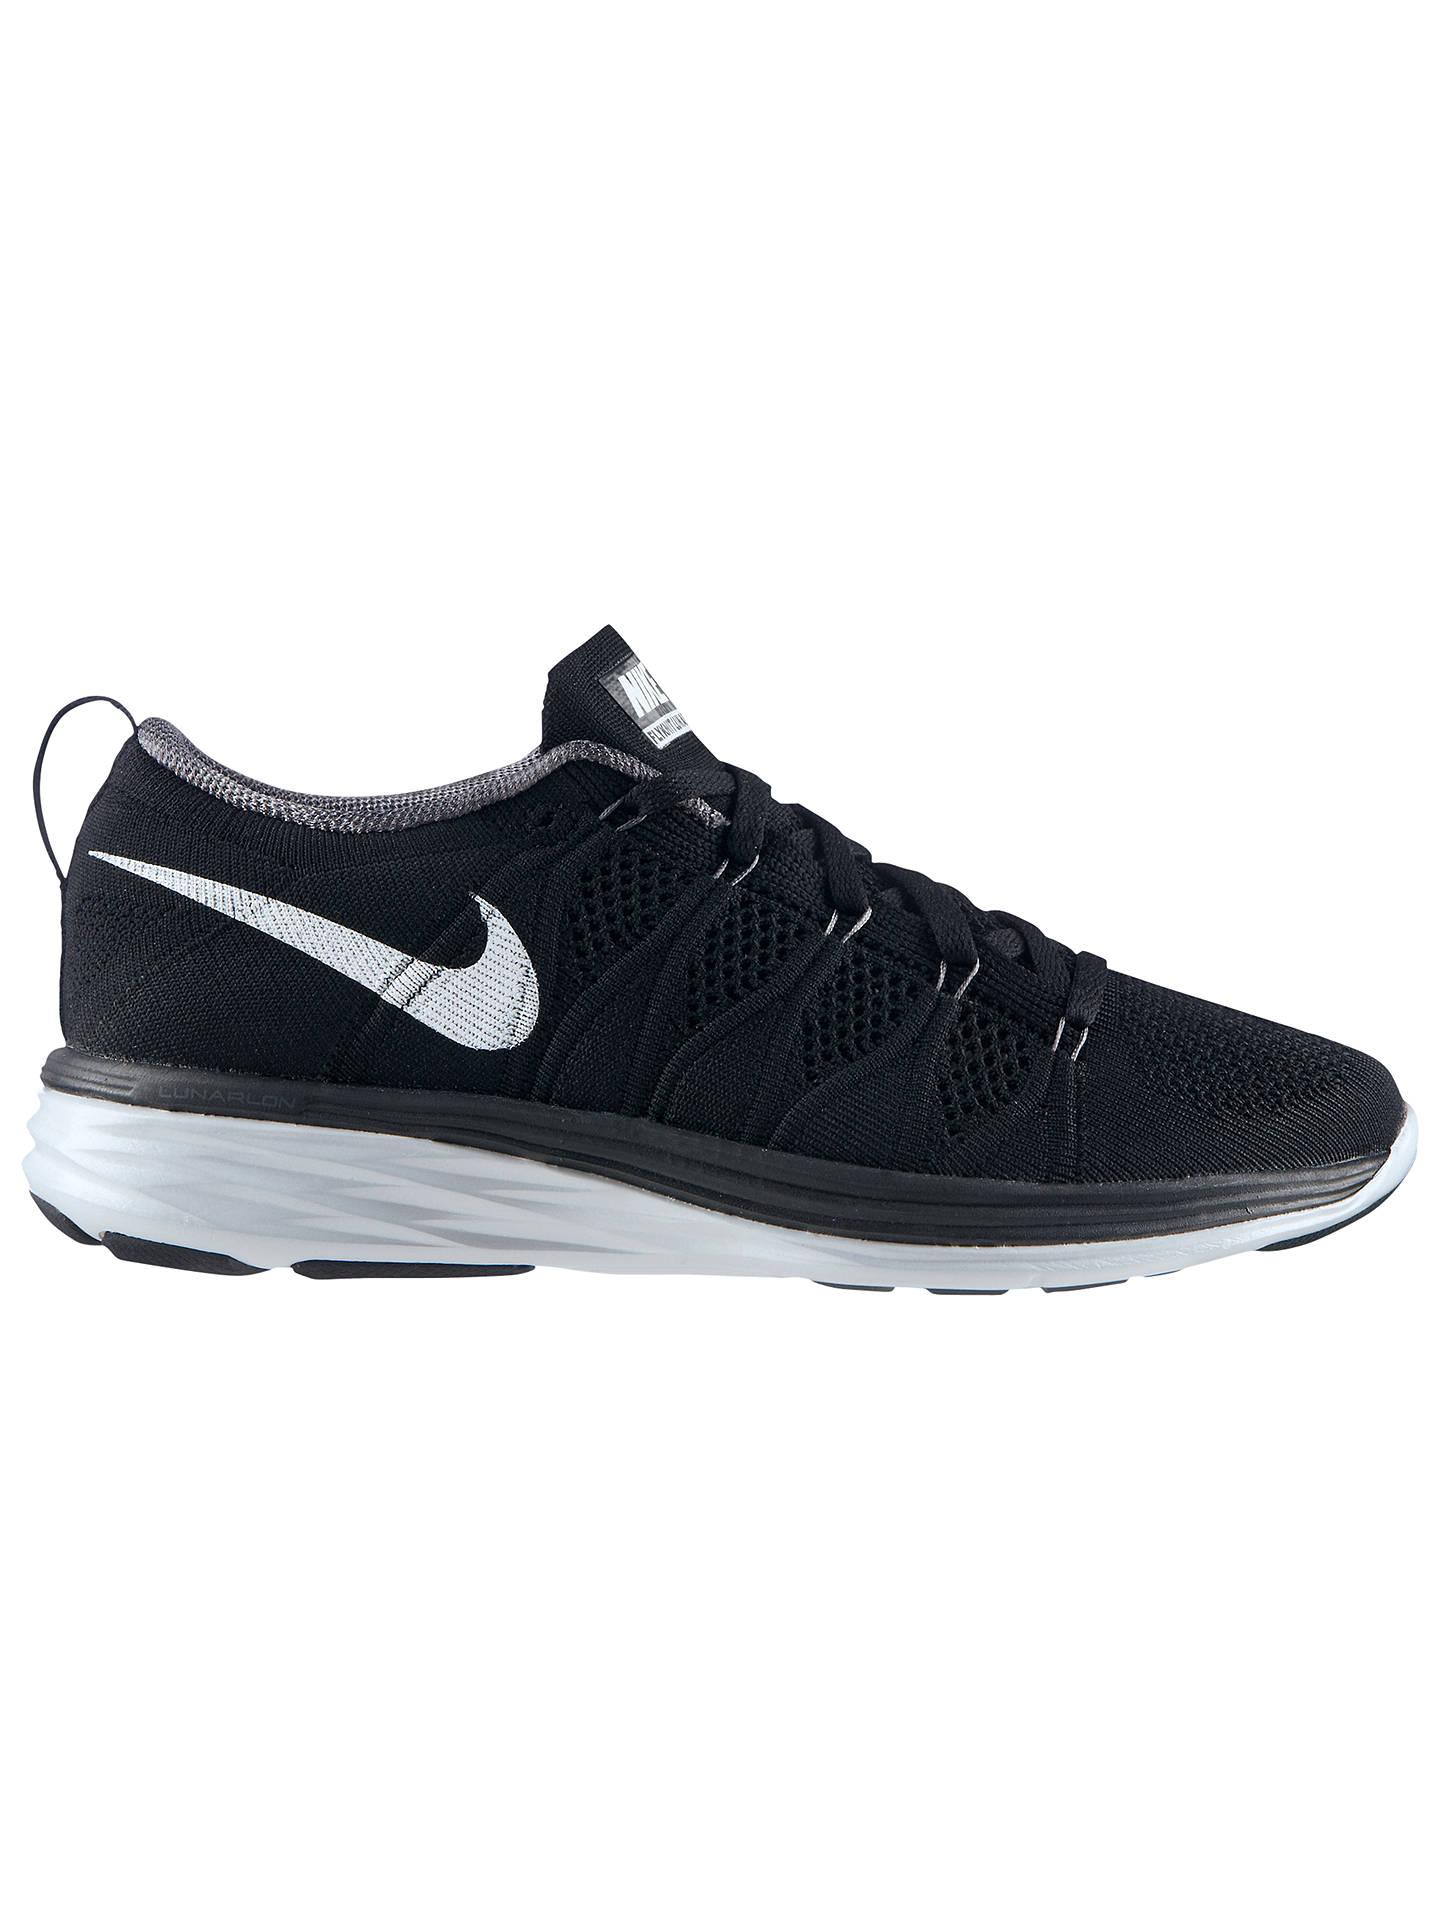 2a981eb6eab62 Nike Flyknit Lunar 2 Women s Running Shoes at John Lewis   Partners